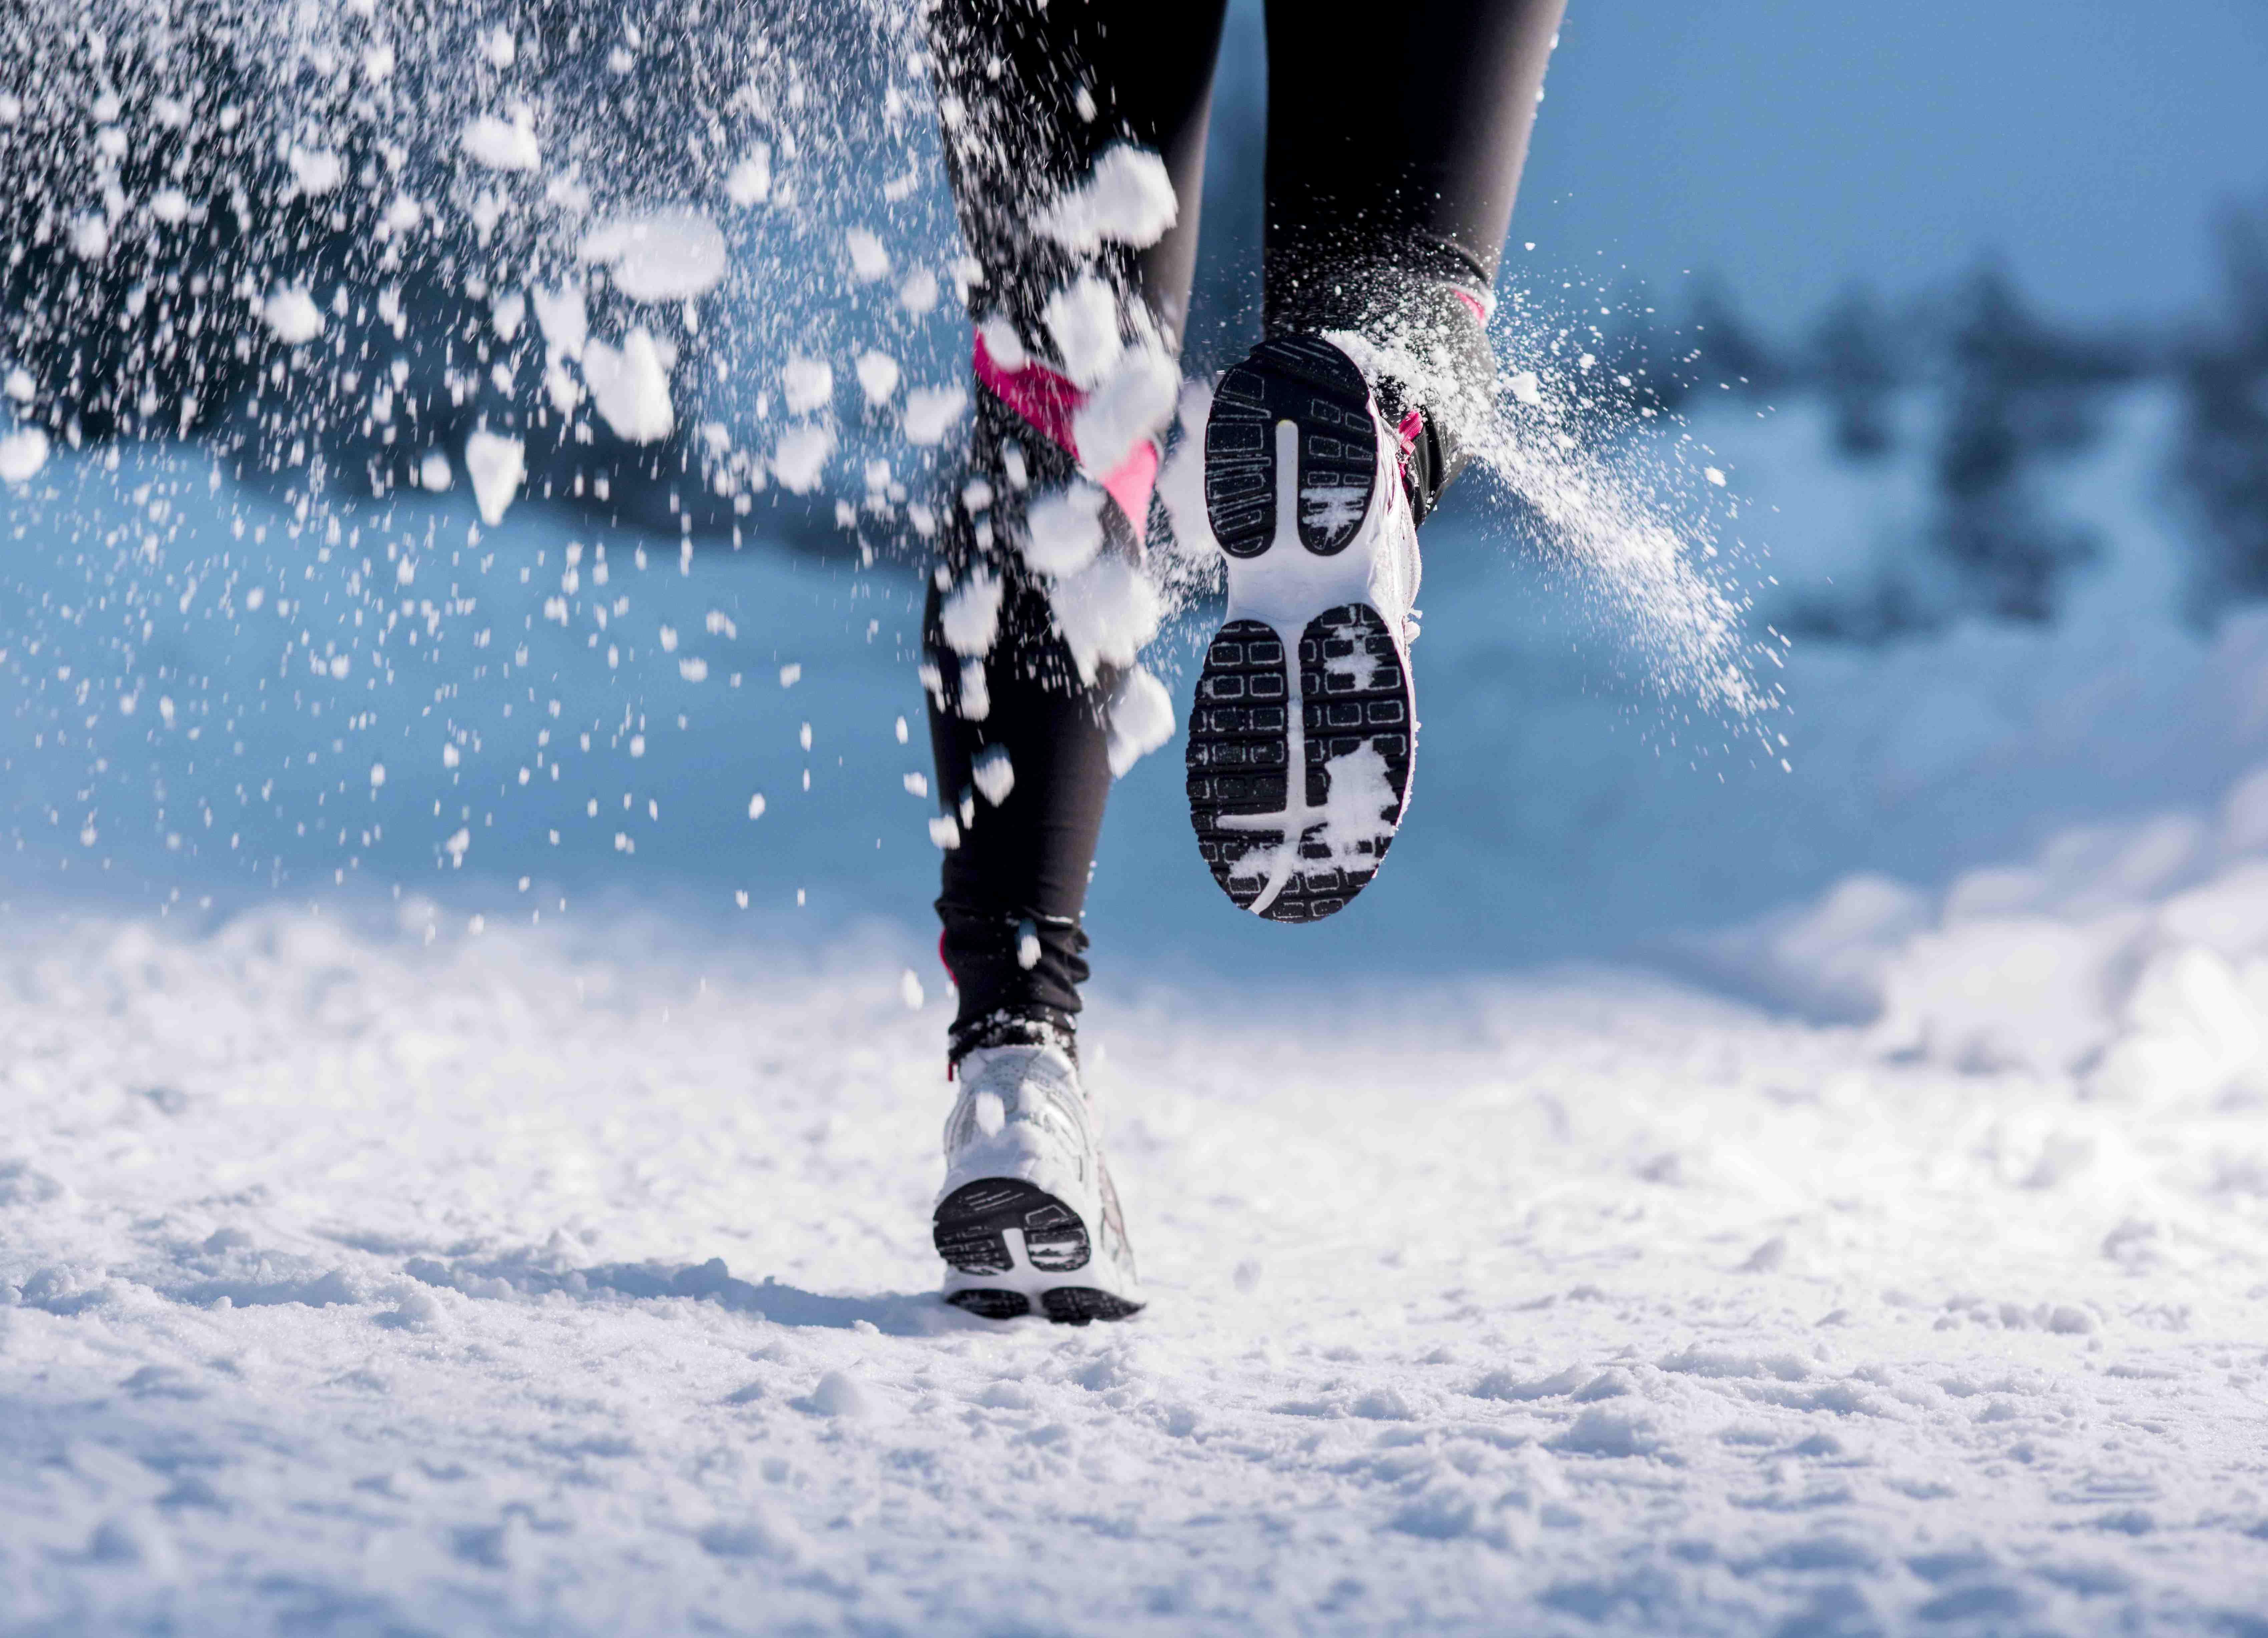 a5eb0e3b Кроссовки для бега зимой по снегу